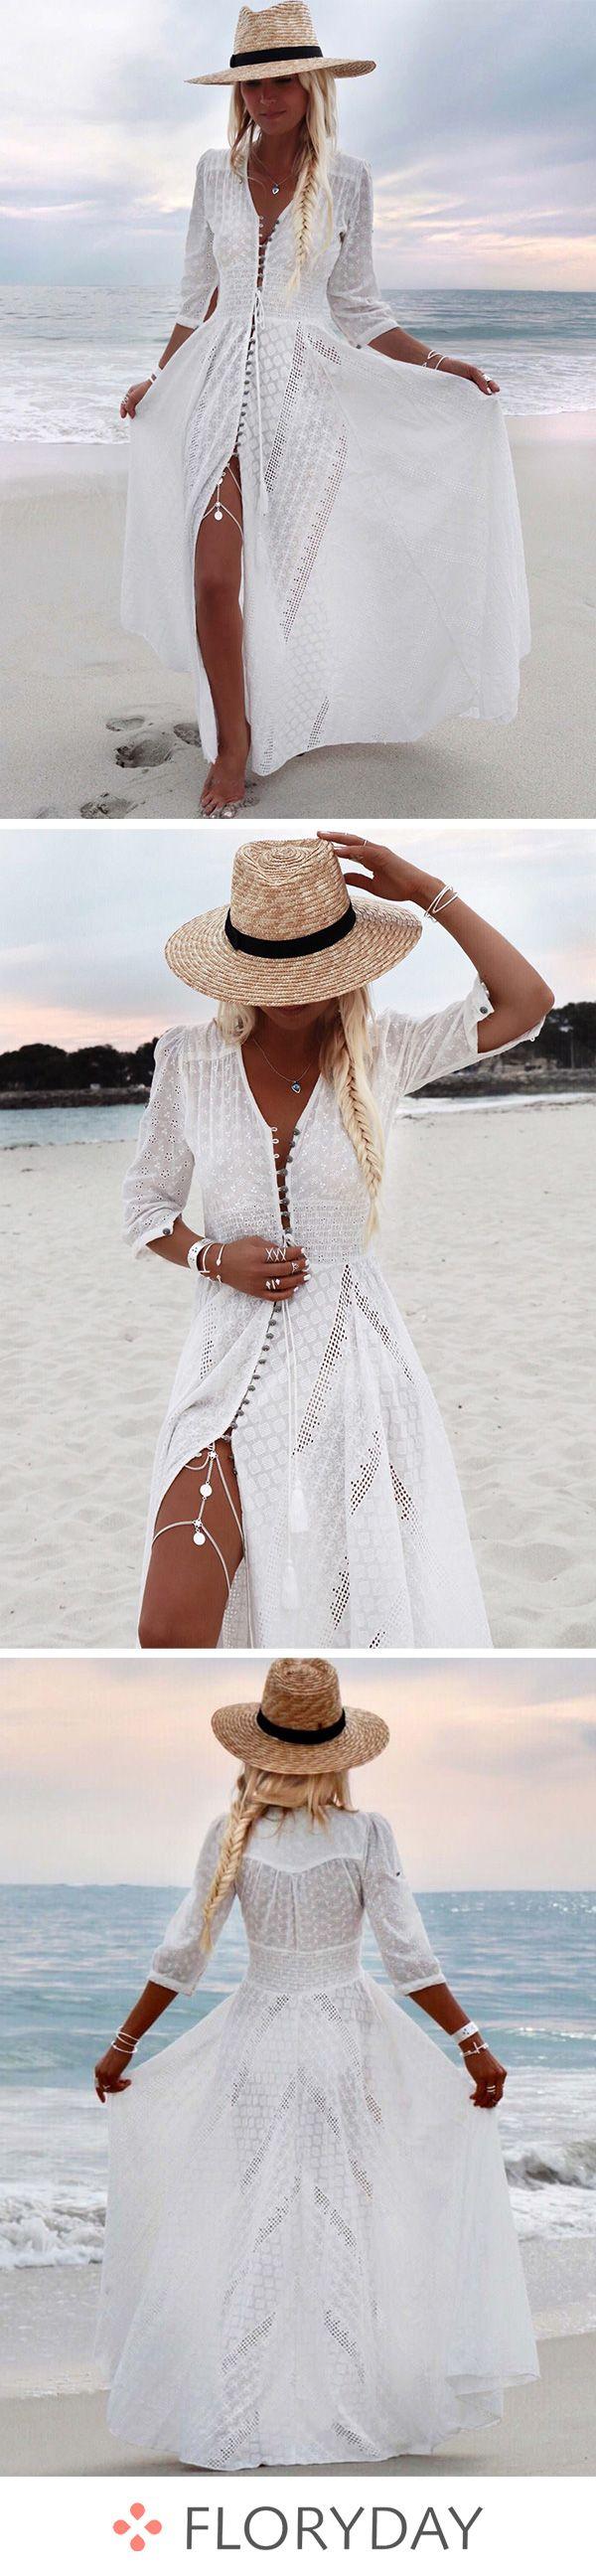 Zandloper maxi-jurk met 3/4 mouwen en effen borduursel